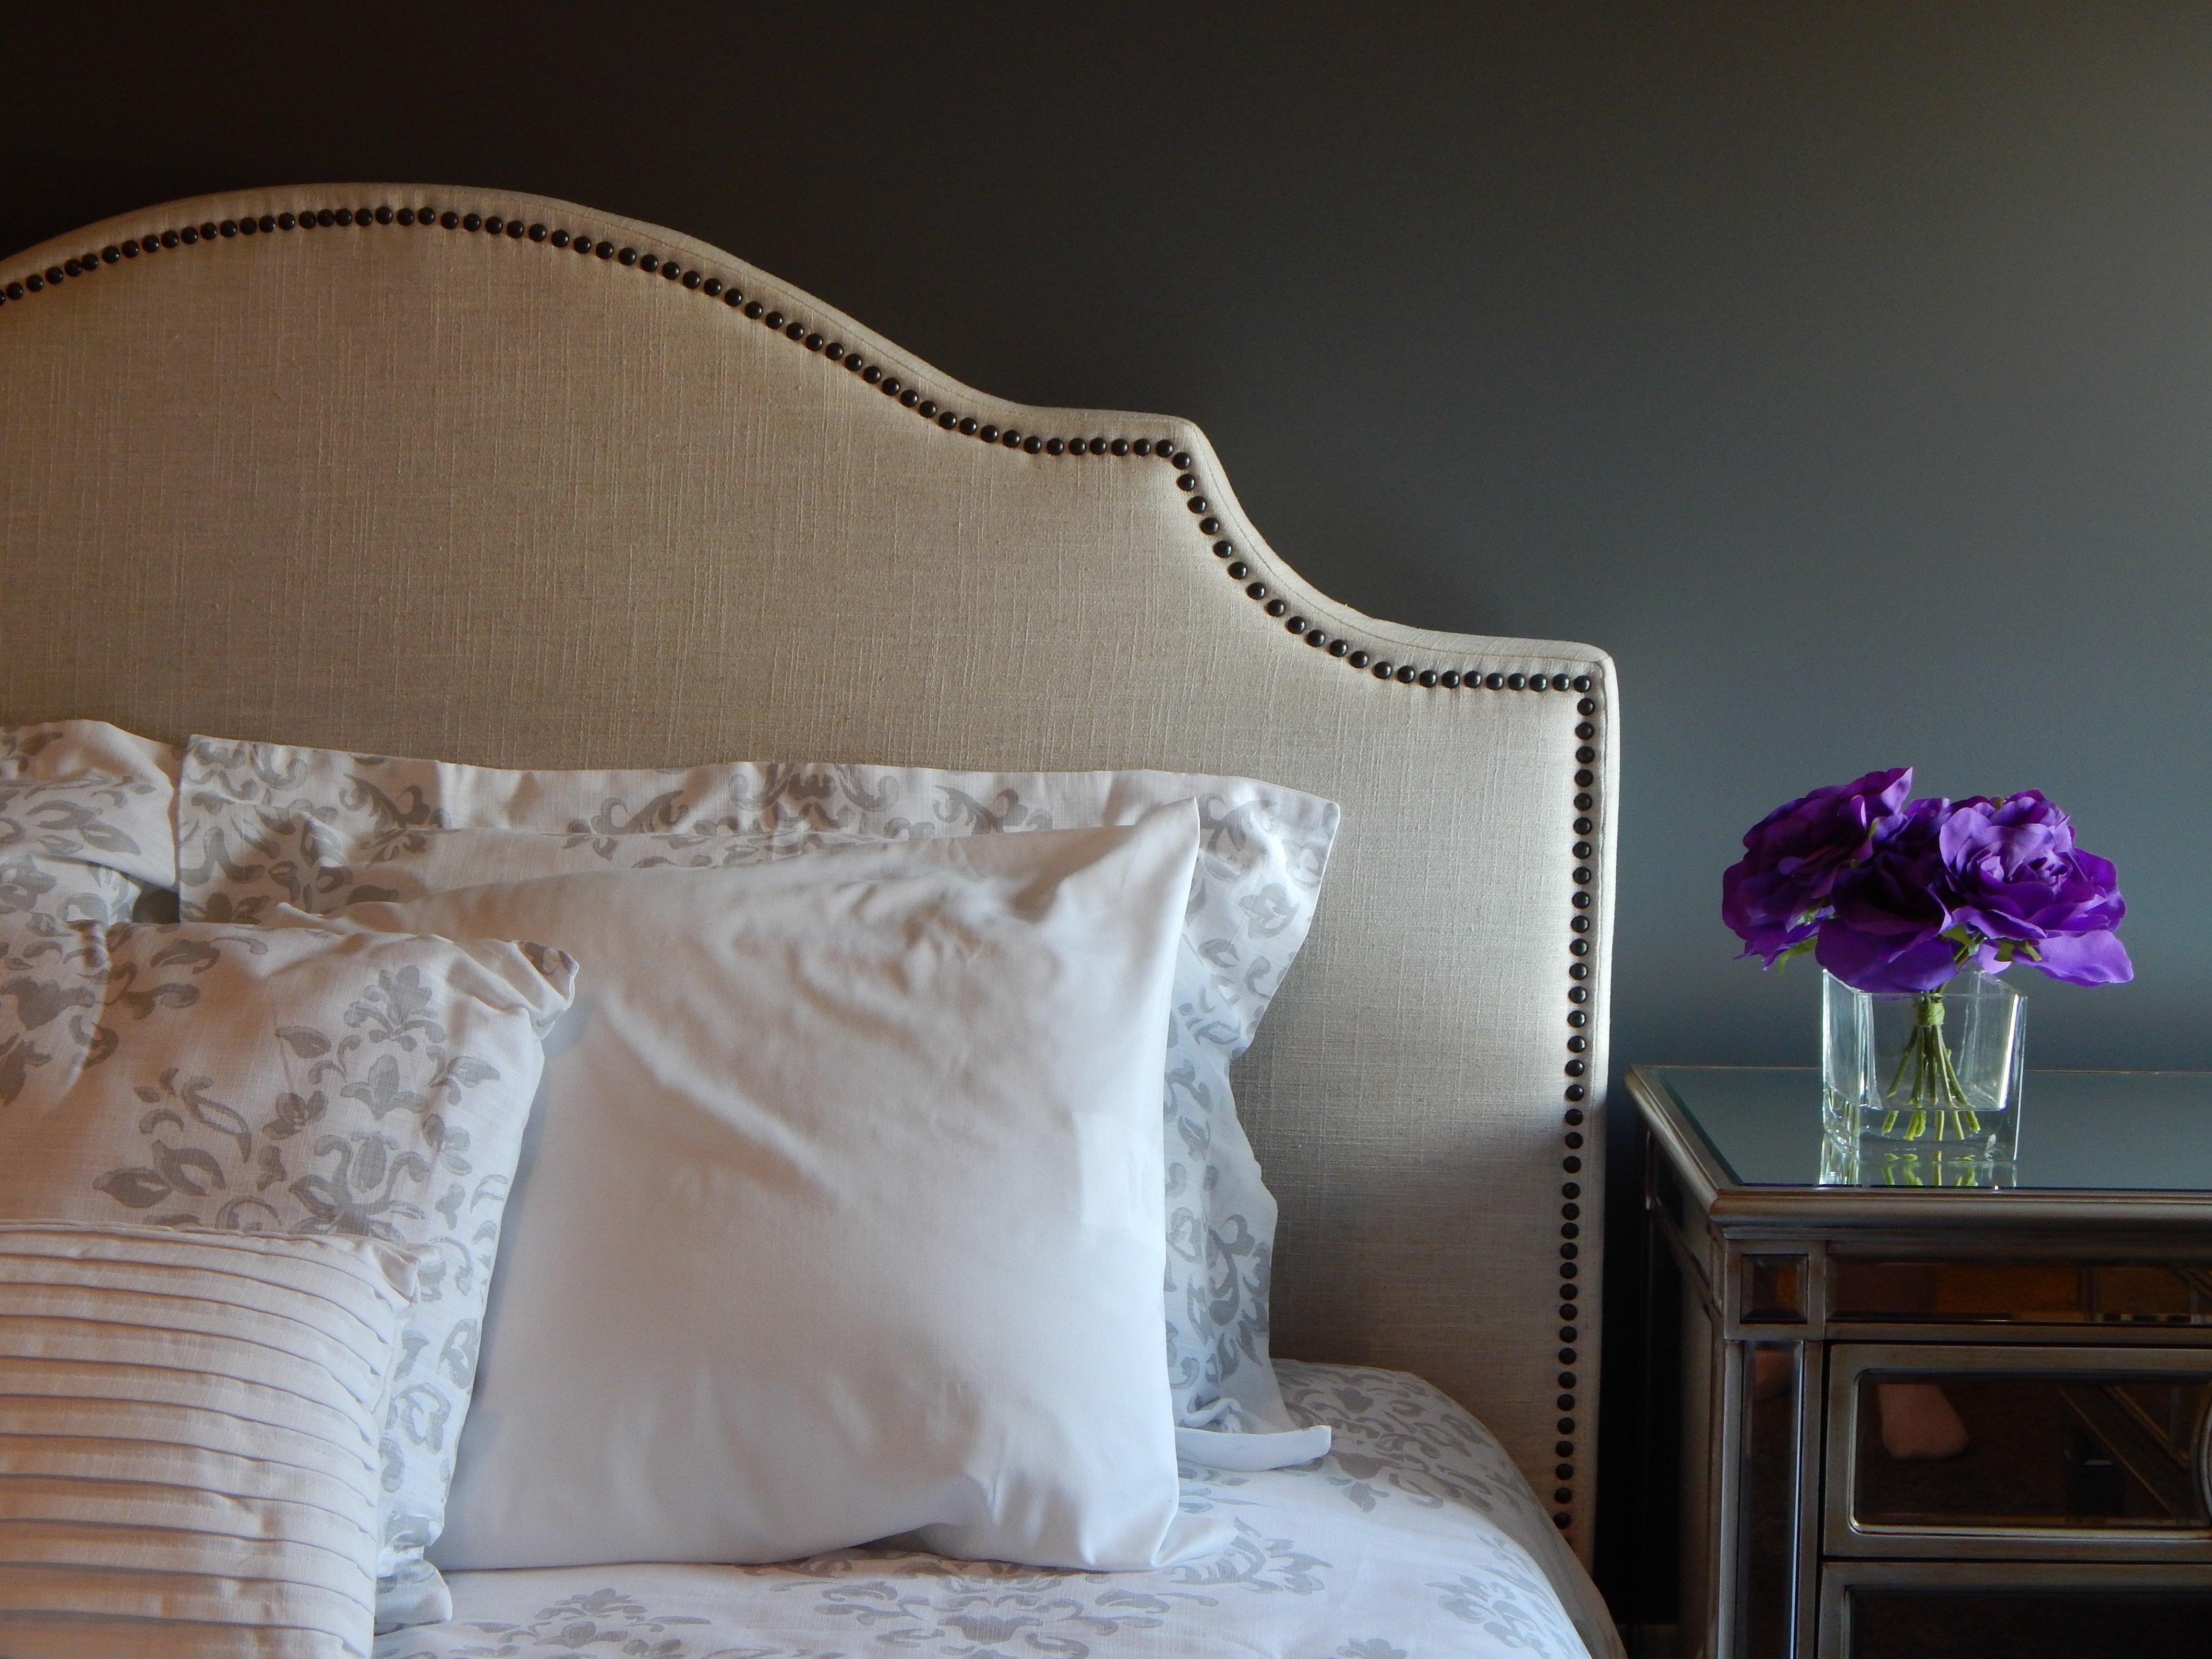 white-interior-home-residential-furniture-room-864963-pxhere.com